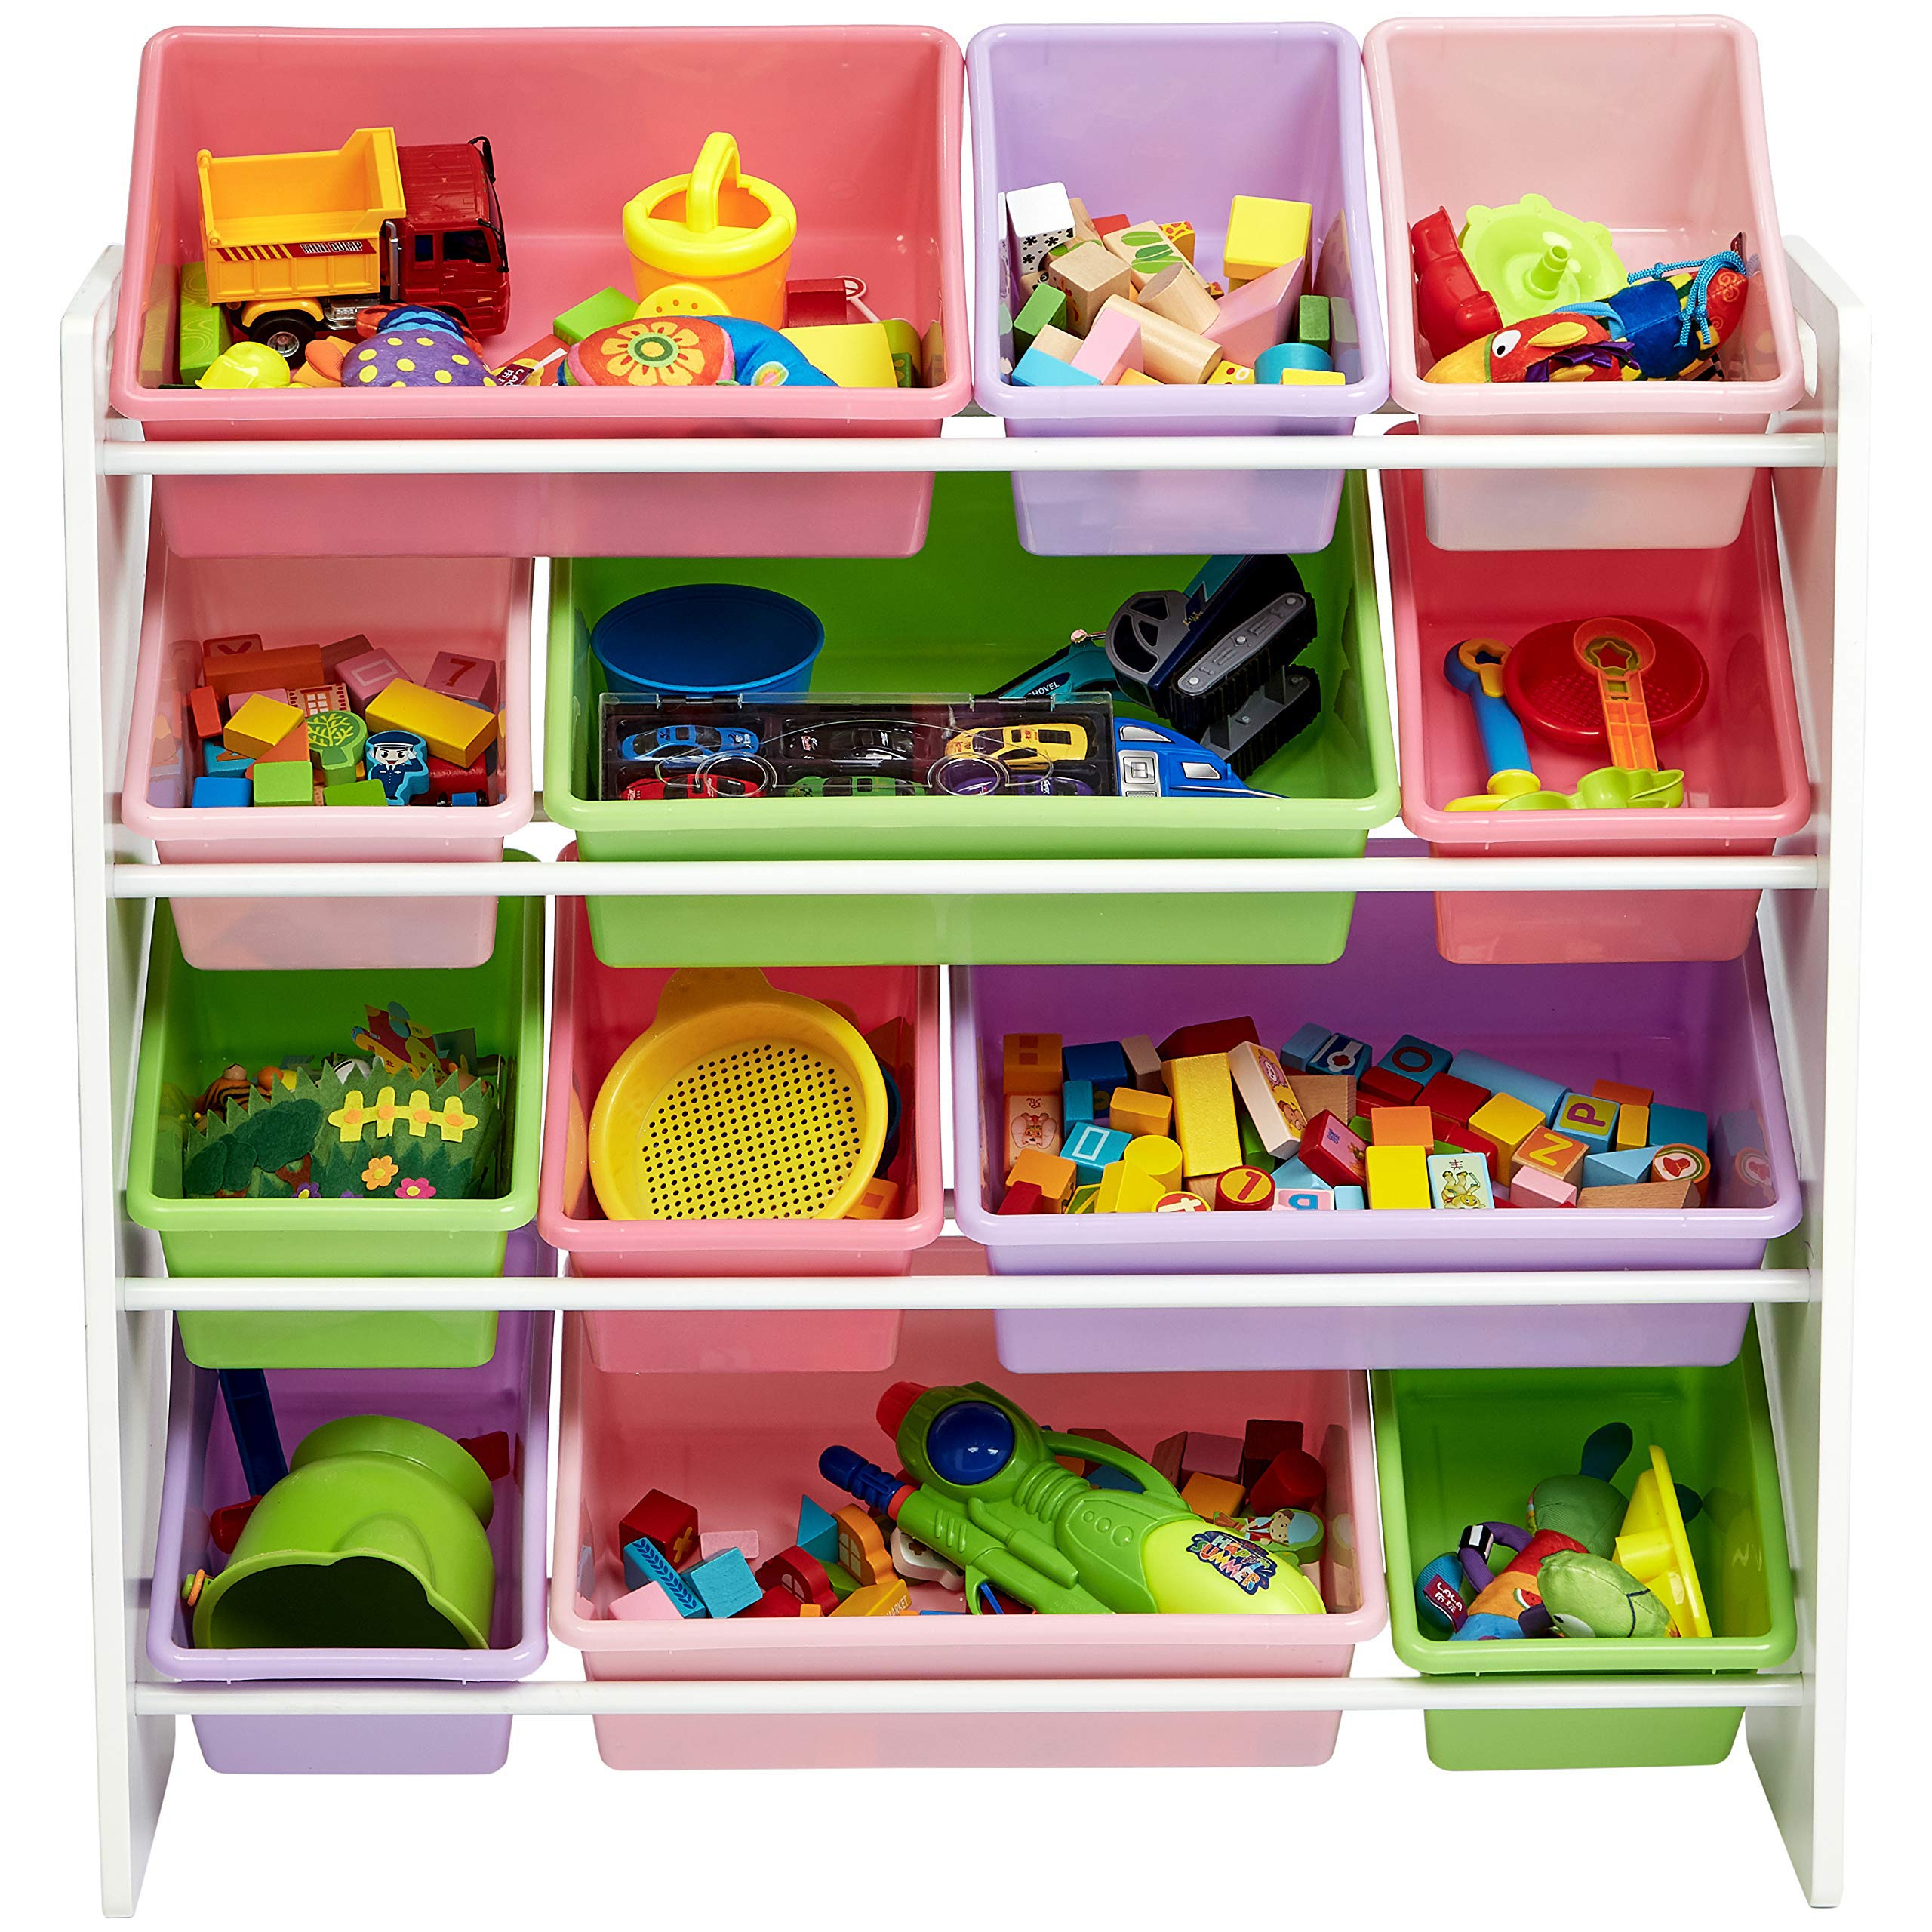 AmazonBasics Kids Toy Storage Organizer Bins - White/Pastel by AmazonBasics (Image #4)